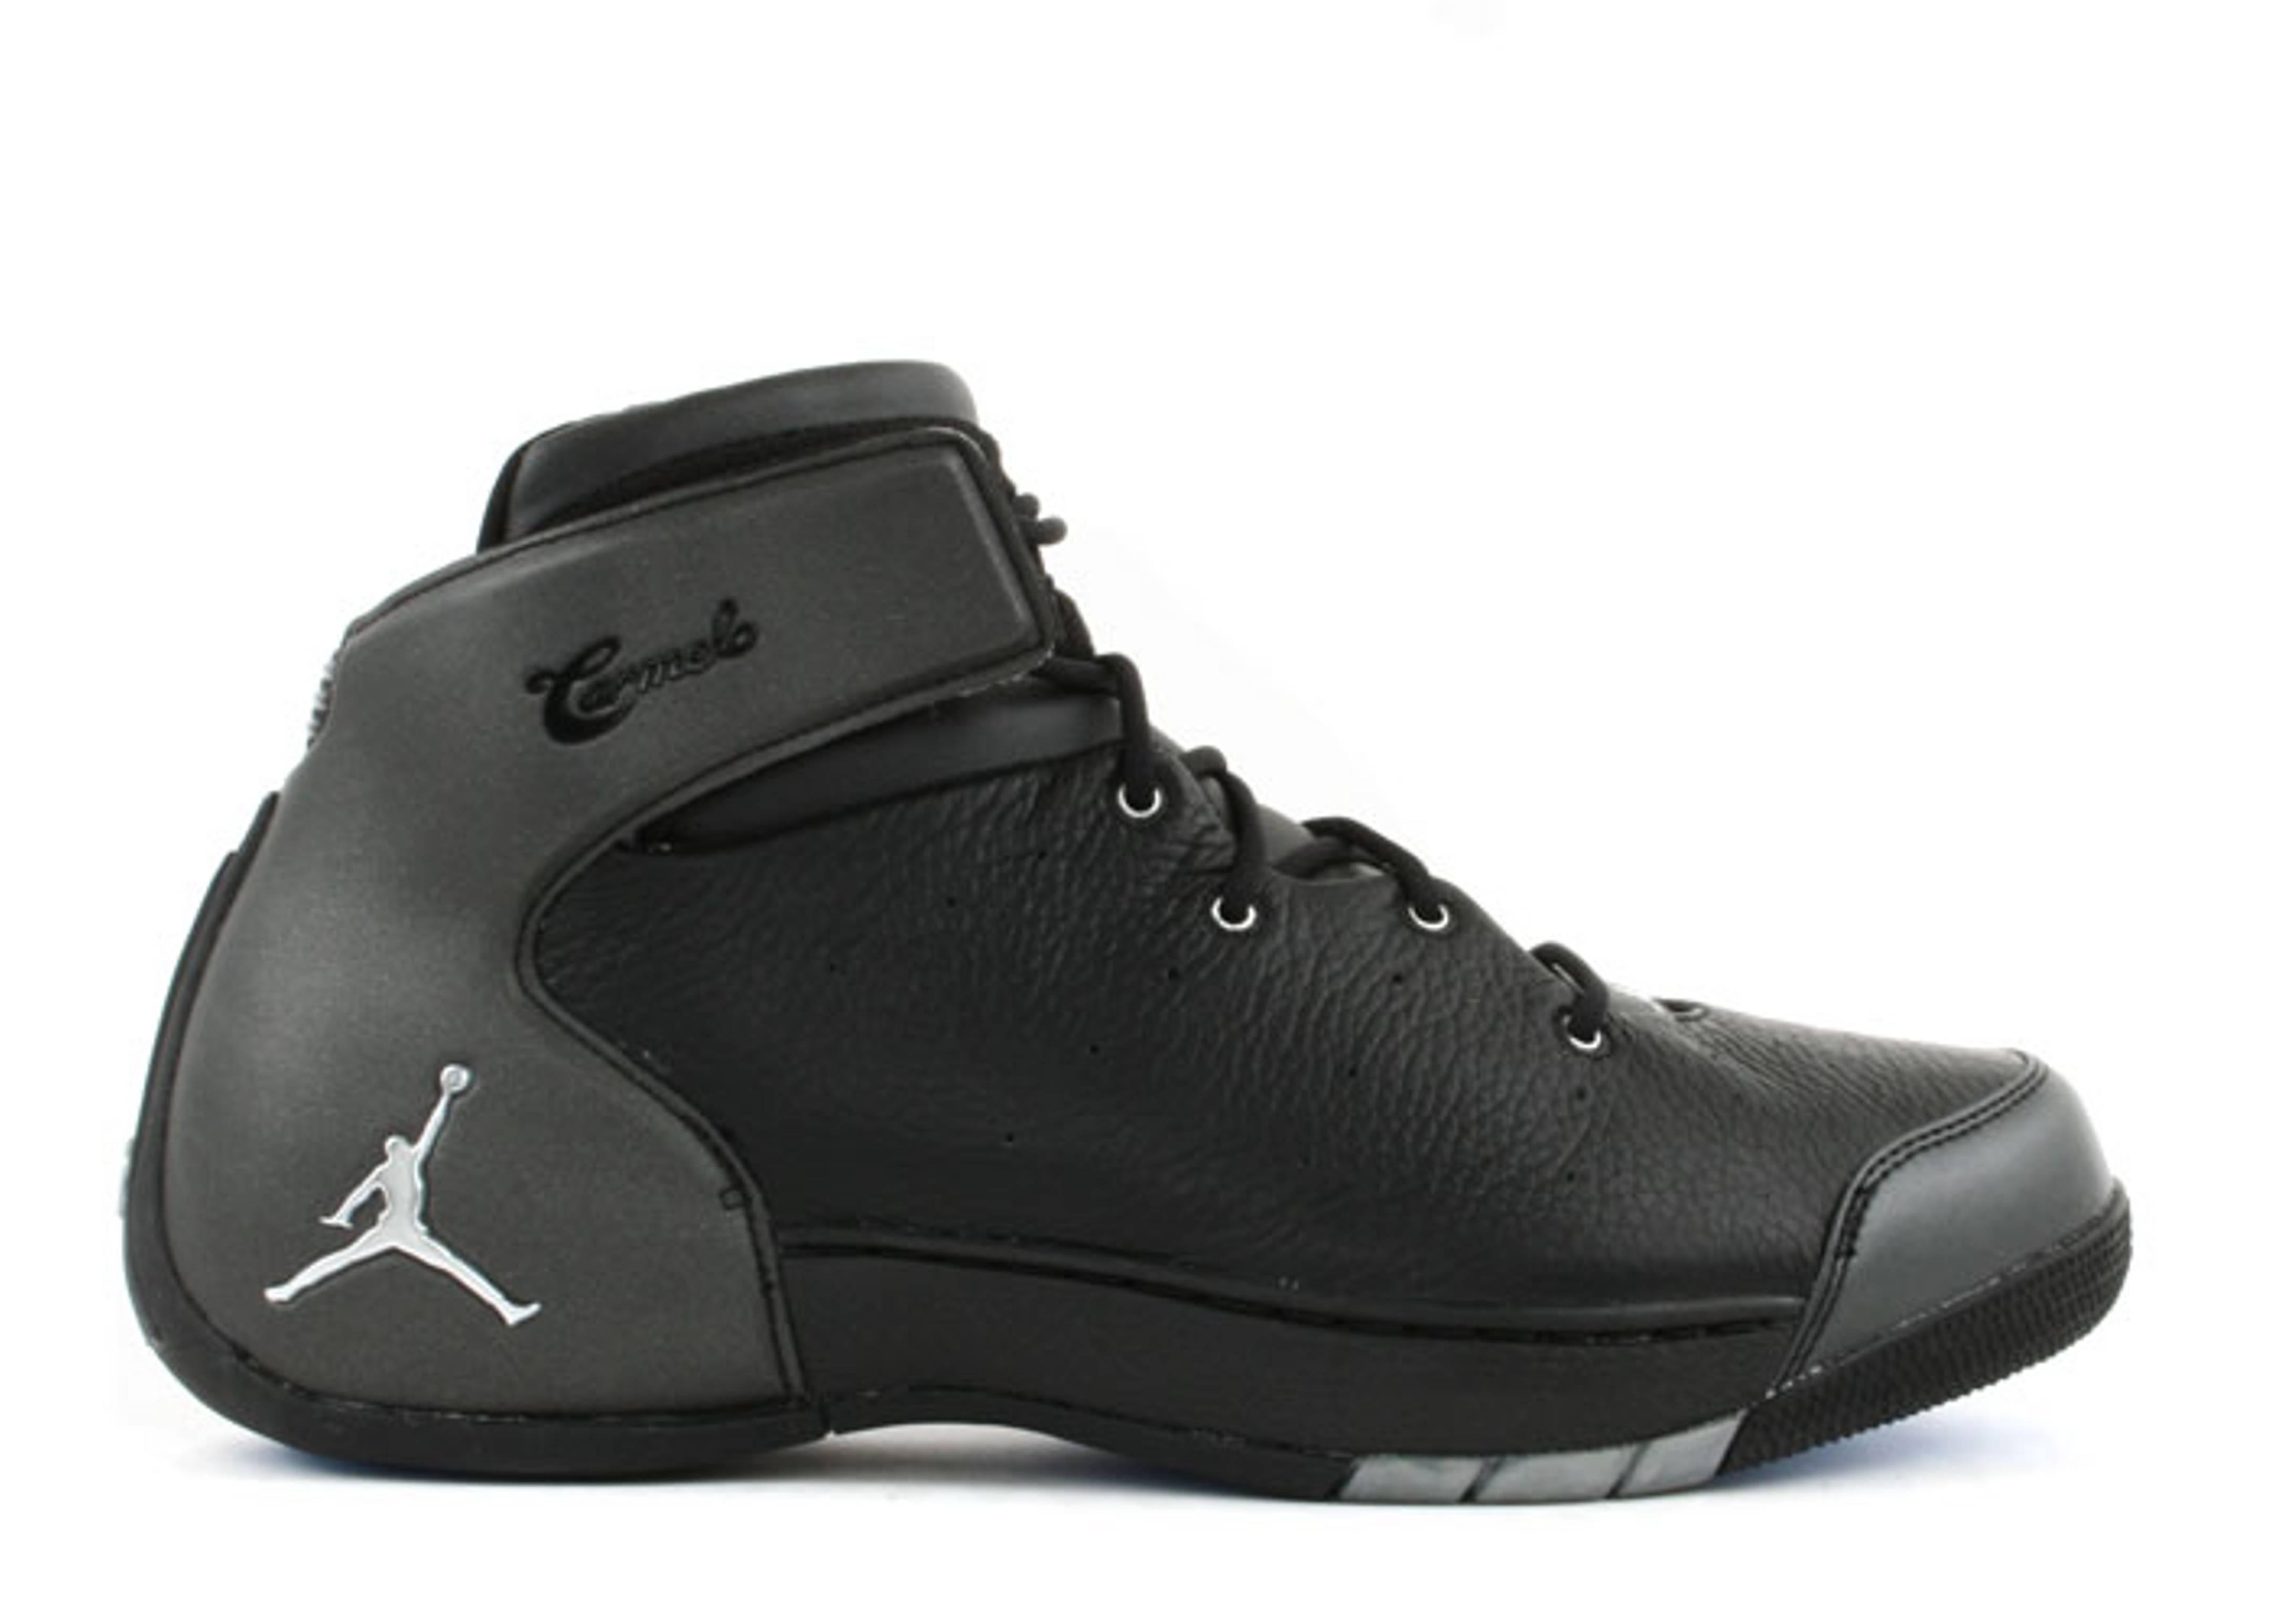 outlet store c9870 df013 Jordan Carmelo 1.5 - Air Jordan - 309265 003 - black ...